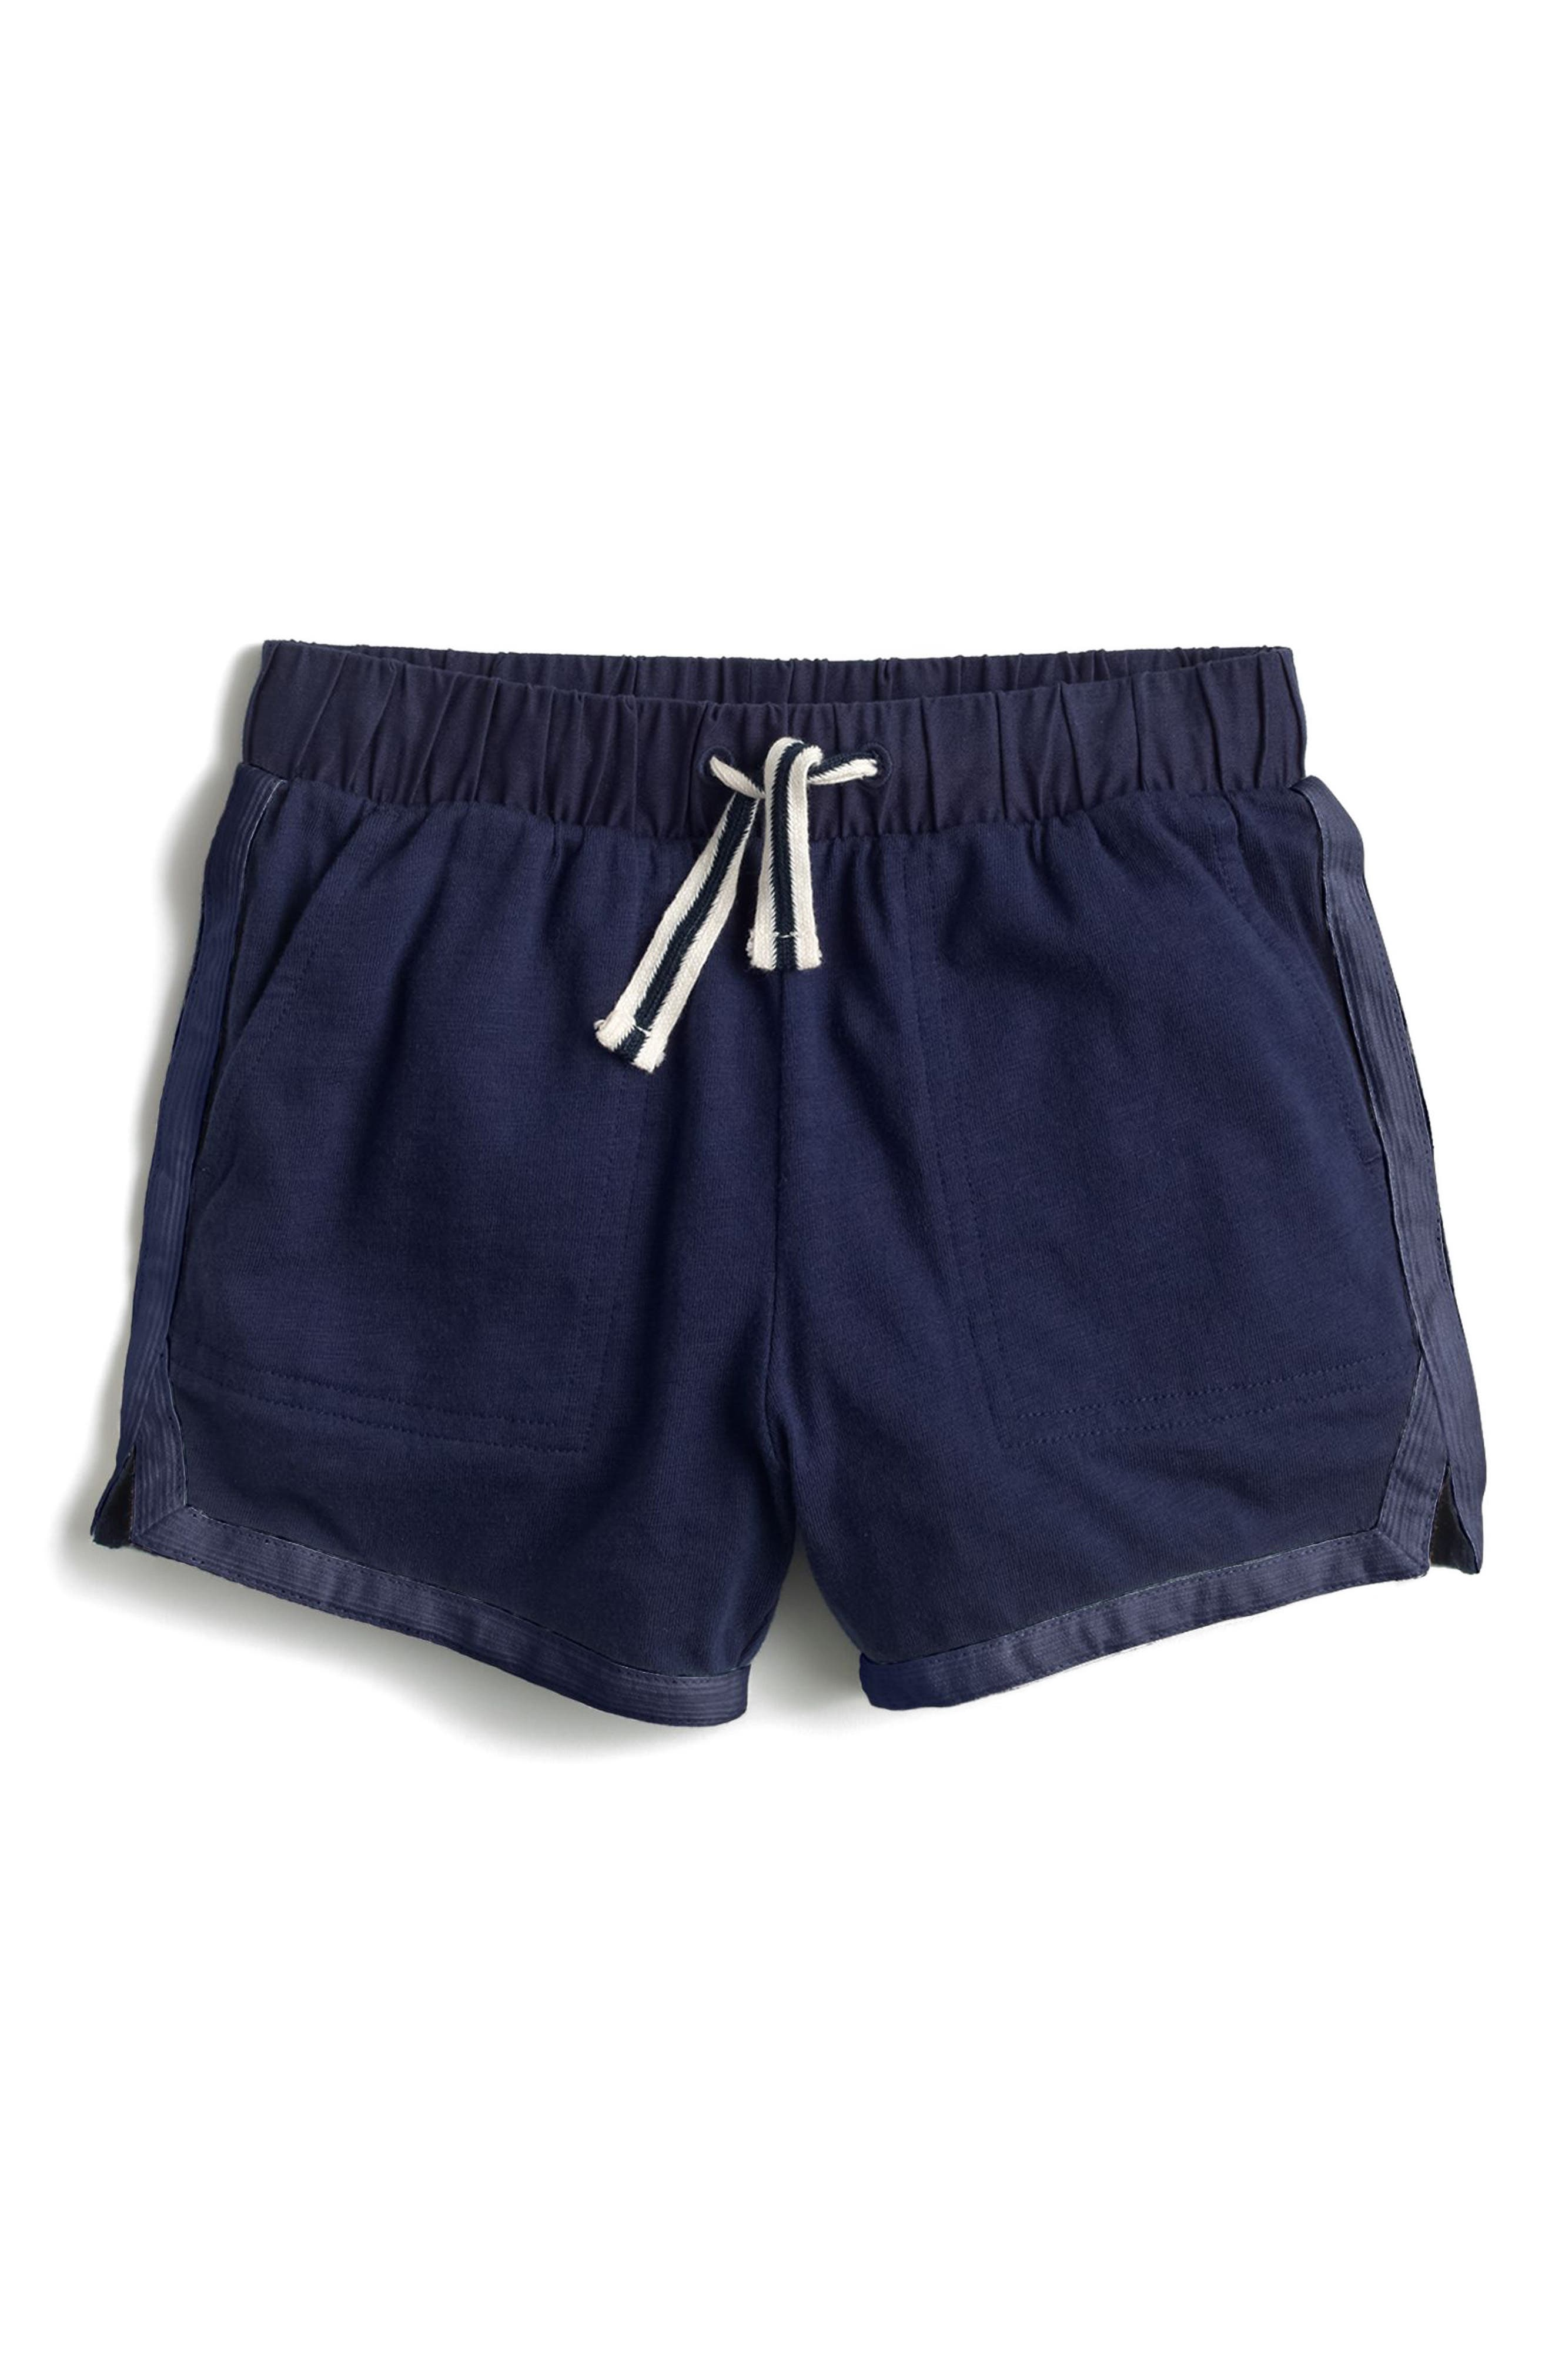 Ester Cotton Shorts,                             Main thumbnail 1, color,                             Navy